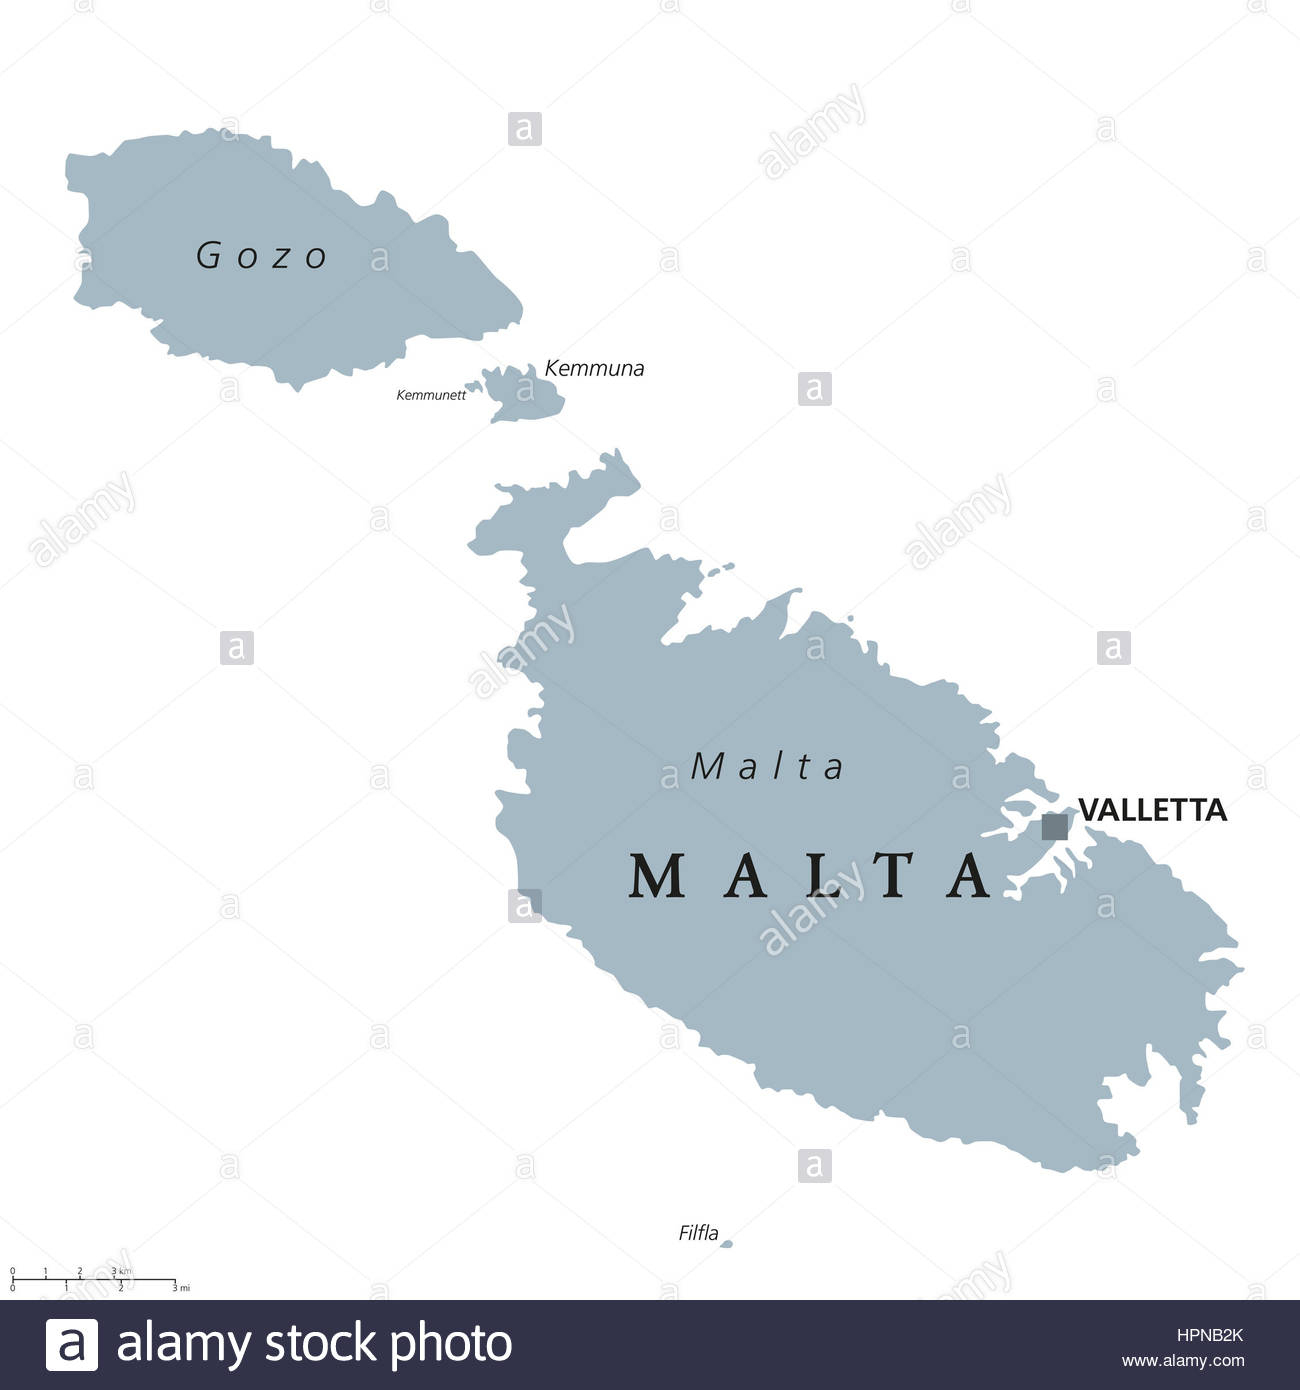 Carte Politique De Malte Avec Capitale De La Valette pour Carte Capitale Europe